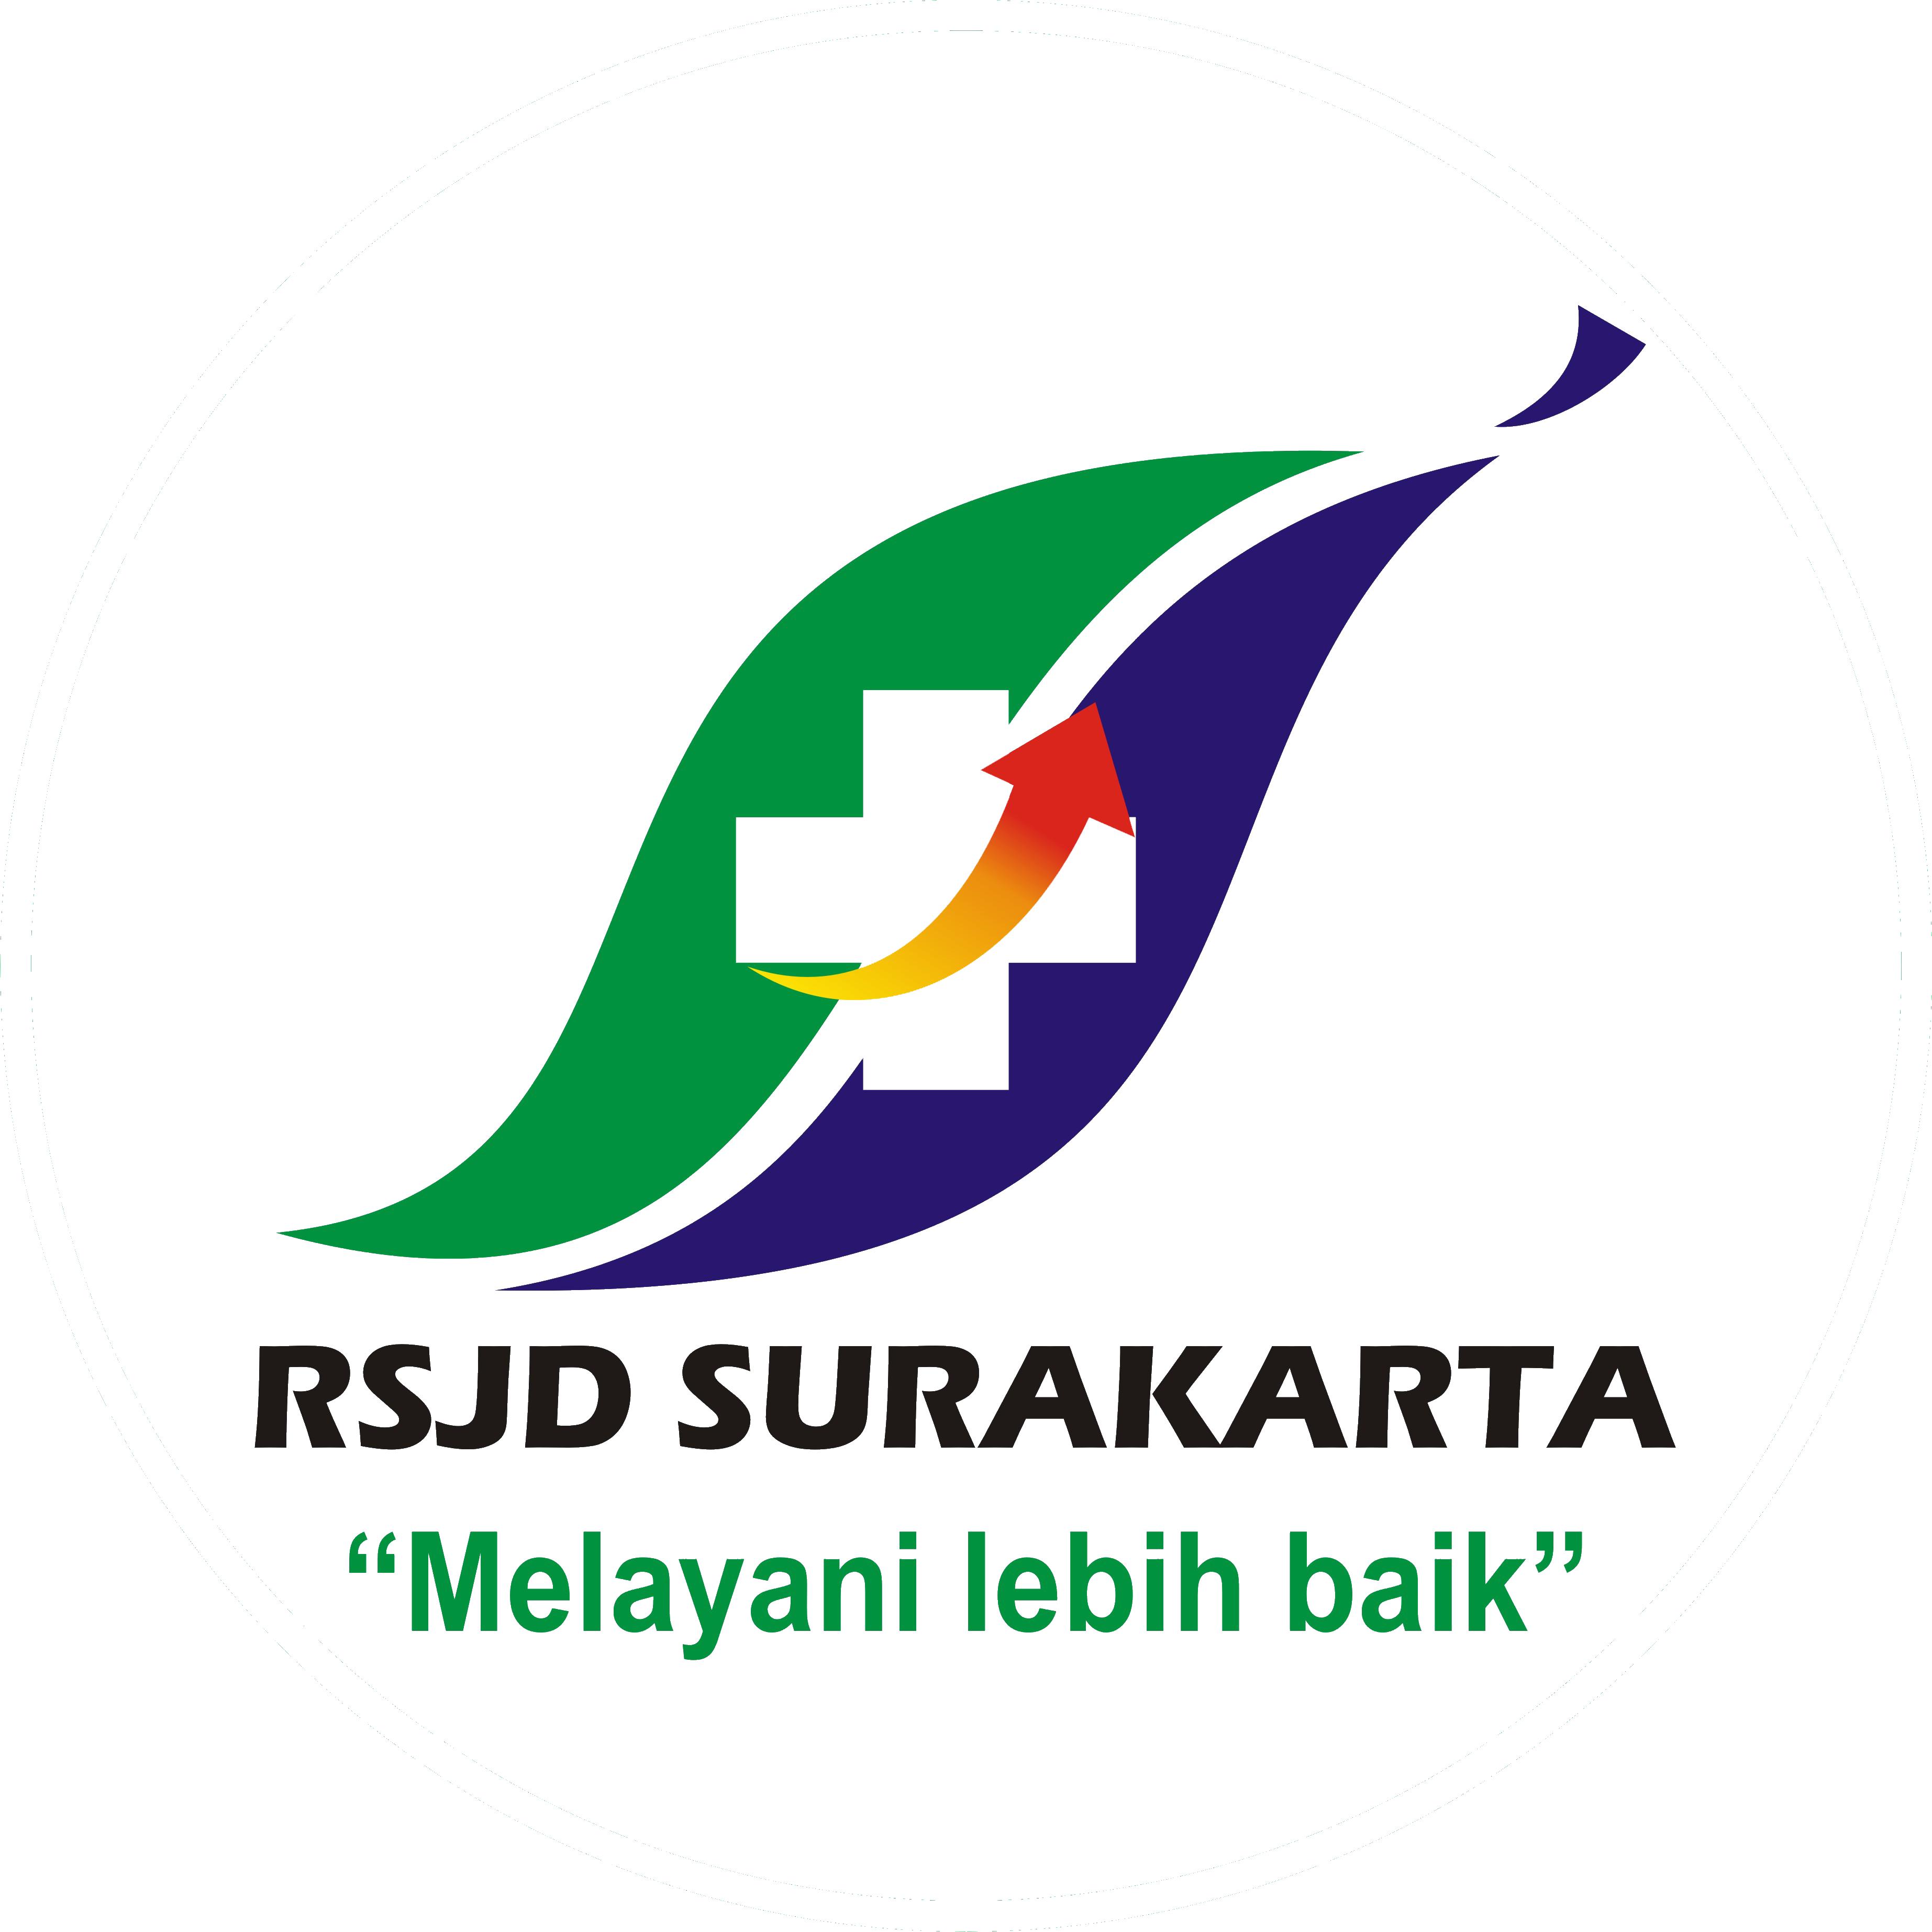 rsjd-surakarta-provinsi-jawa-tengah